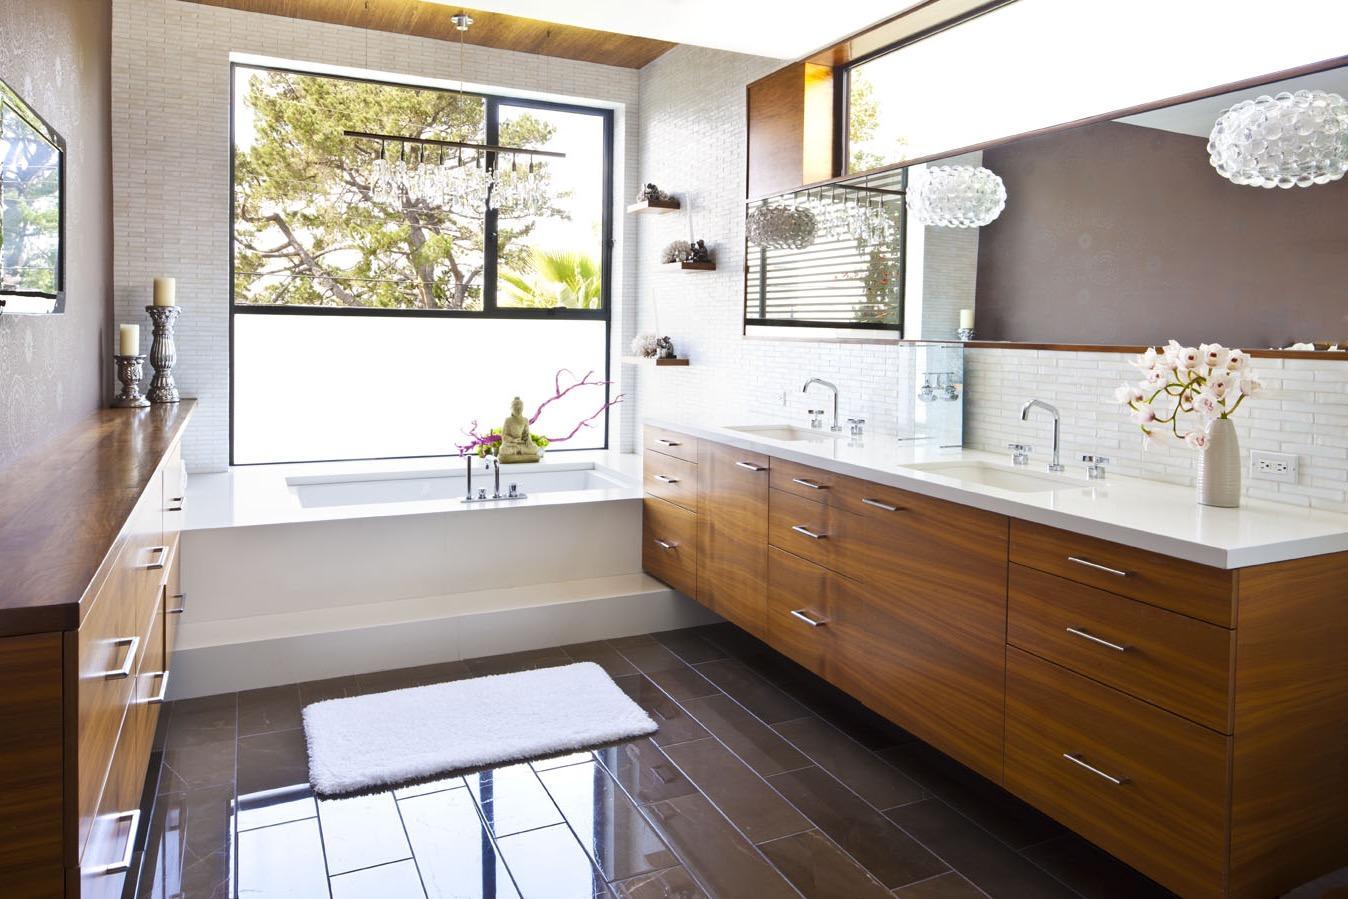 2017 modern bathroom furniture trend and ideas 15145 - Mid century modern double bathroom vanity ...